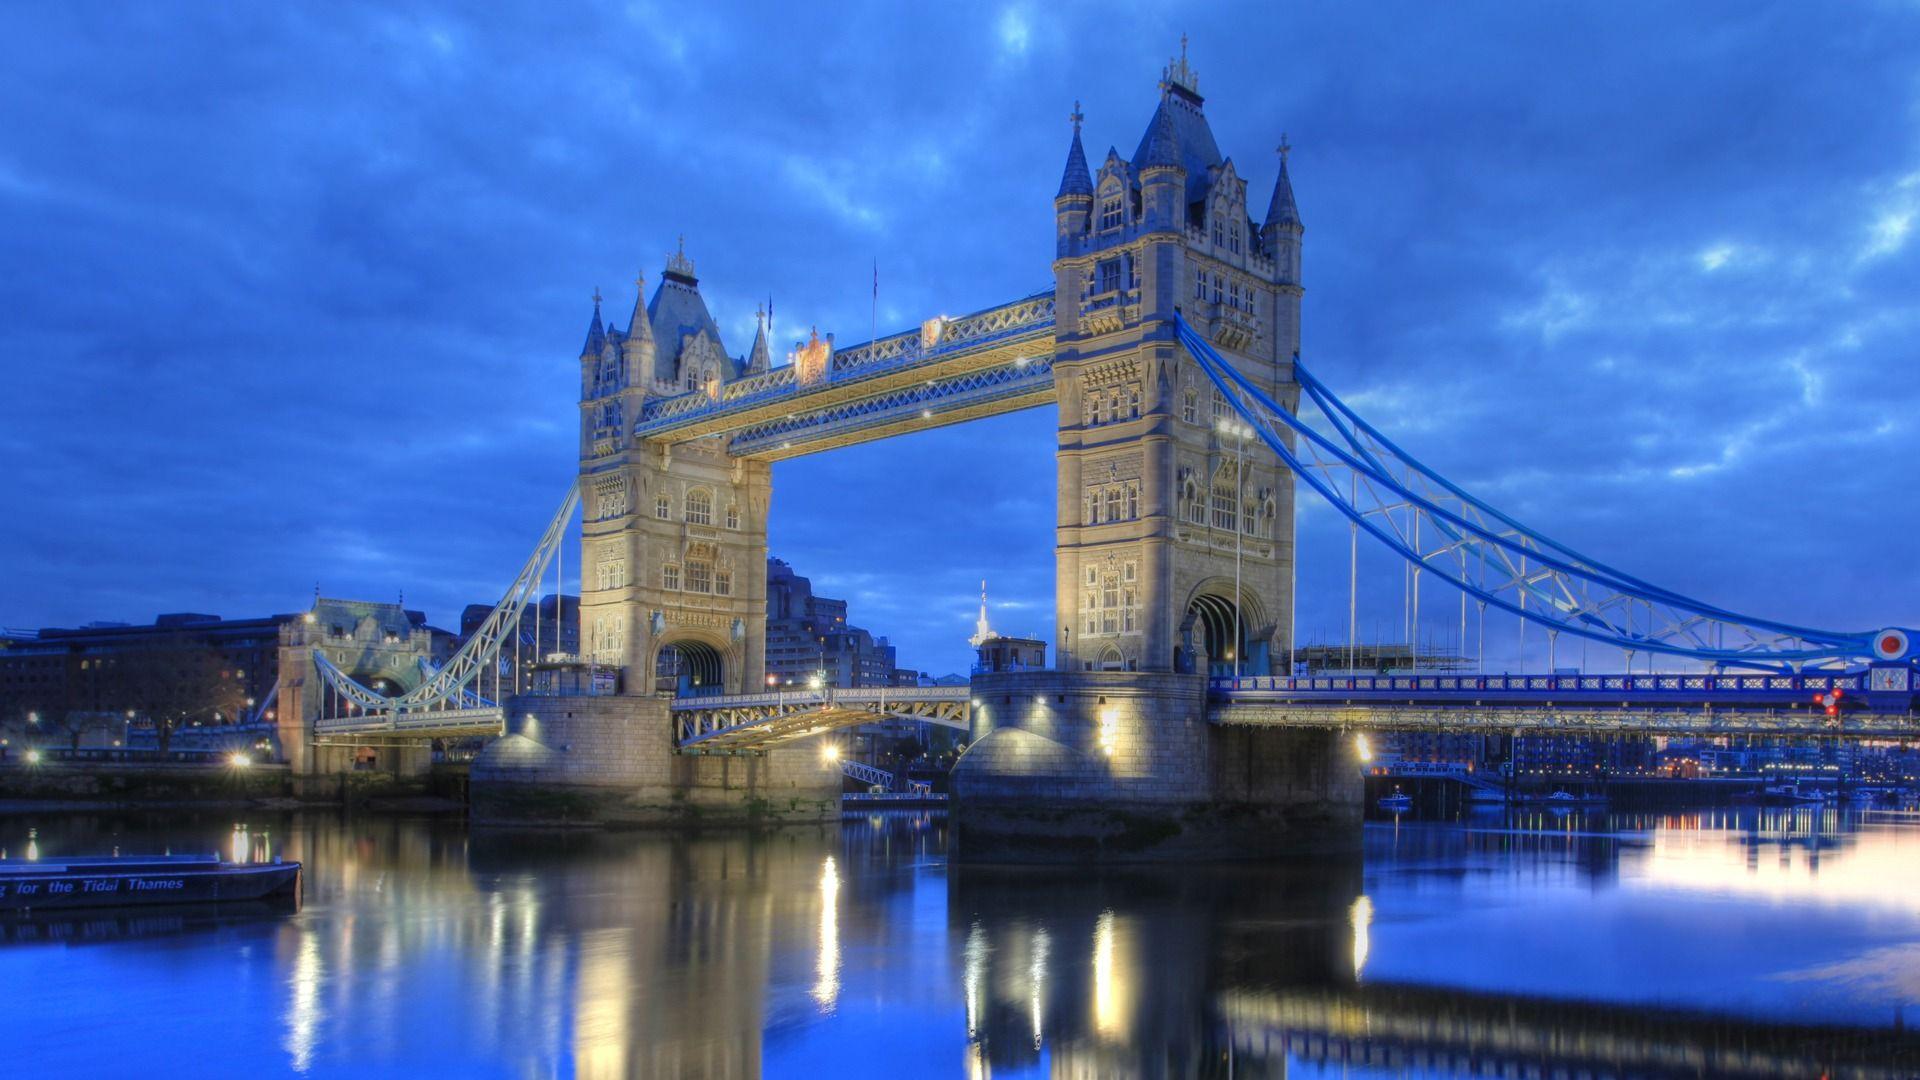 London Bridge 1080p HD Widescreen Wallpapers